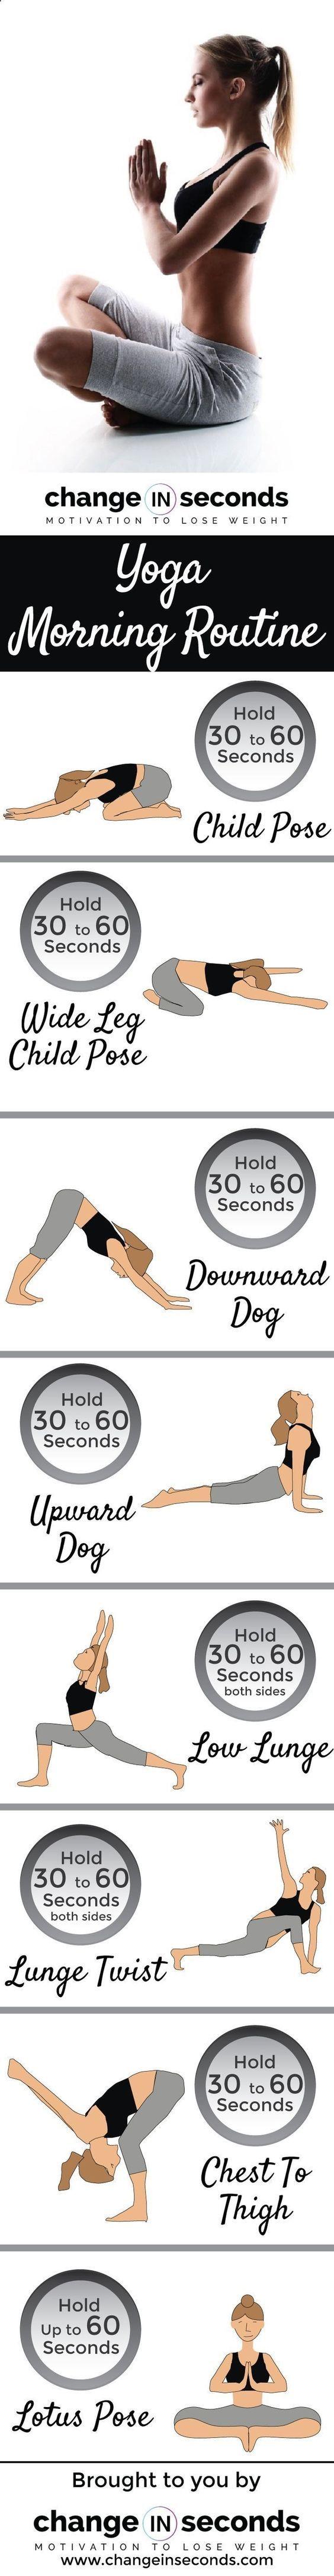 Sport Tank - Yoga Mind & Body | Yoga routine for beginners ...